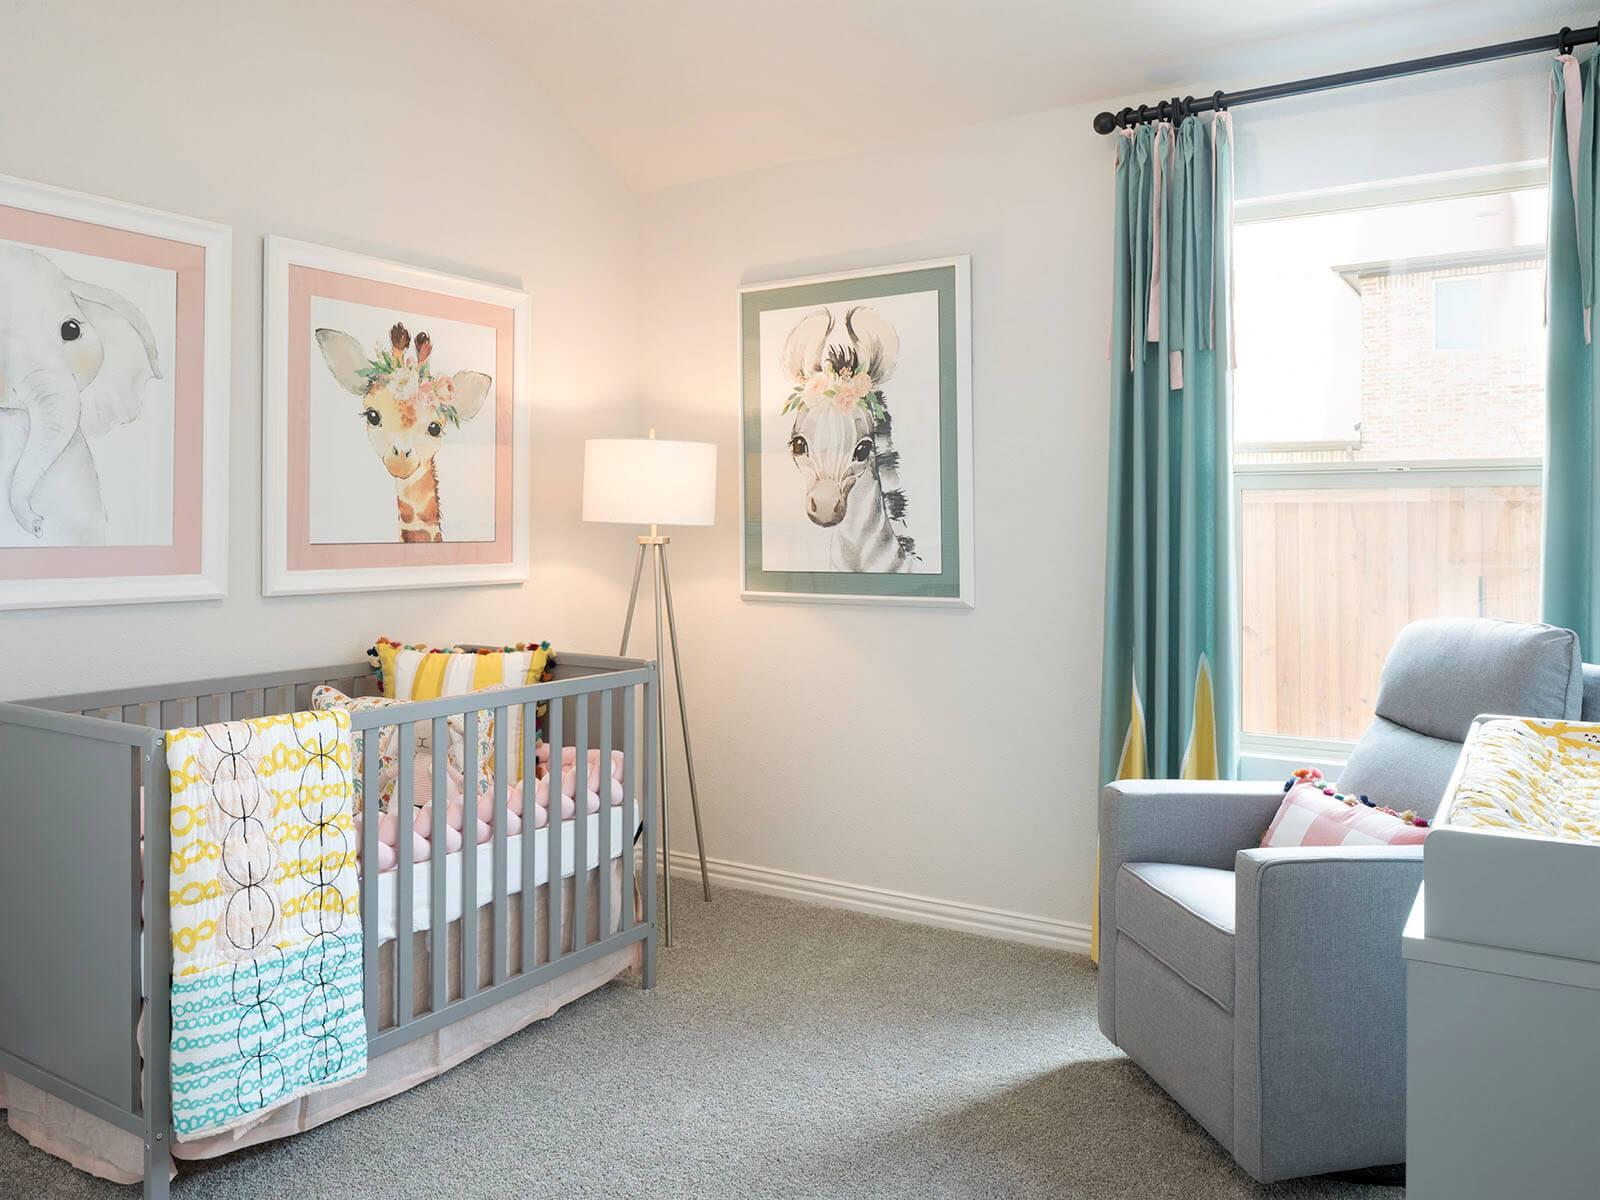 Bedroom featured in The Preston By Meritage Homes in Dallas, TX